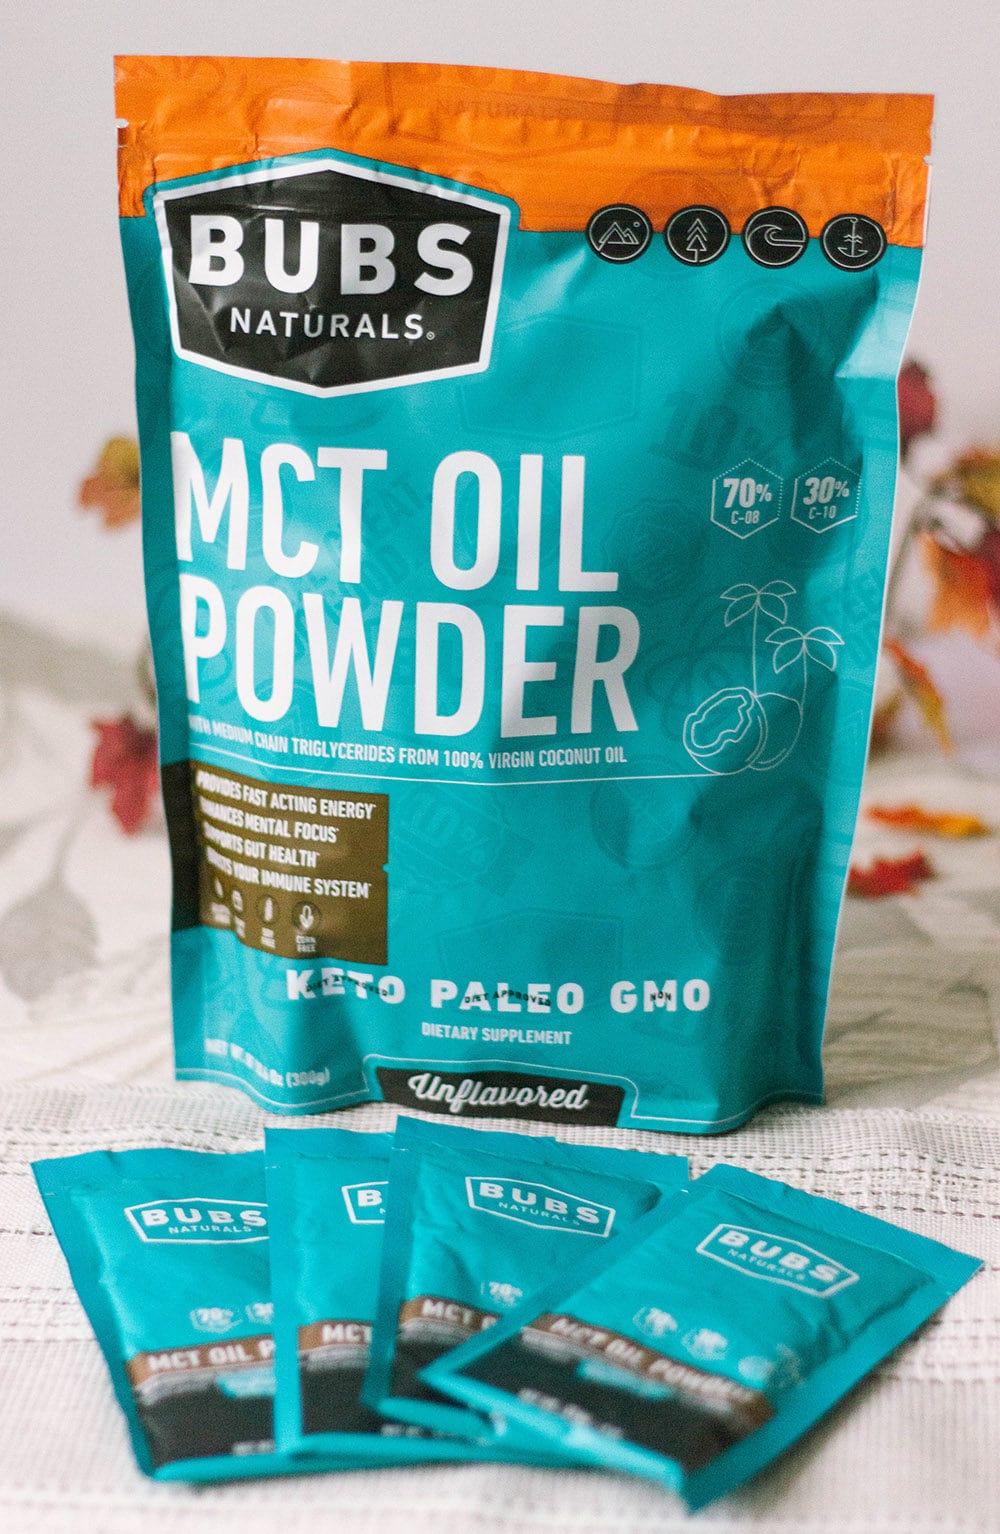 BUBS MCT Oil Powder